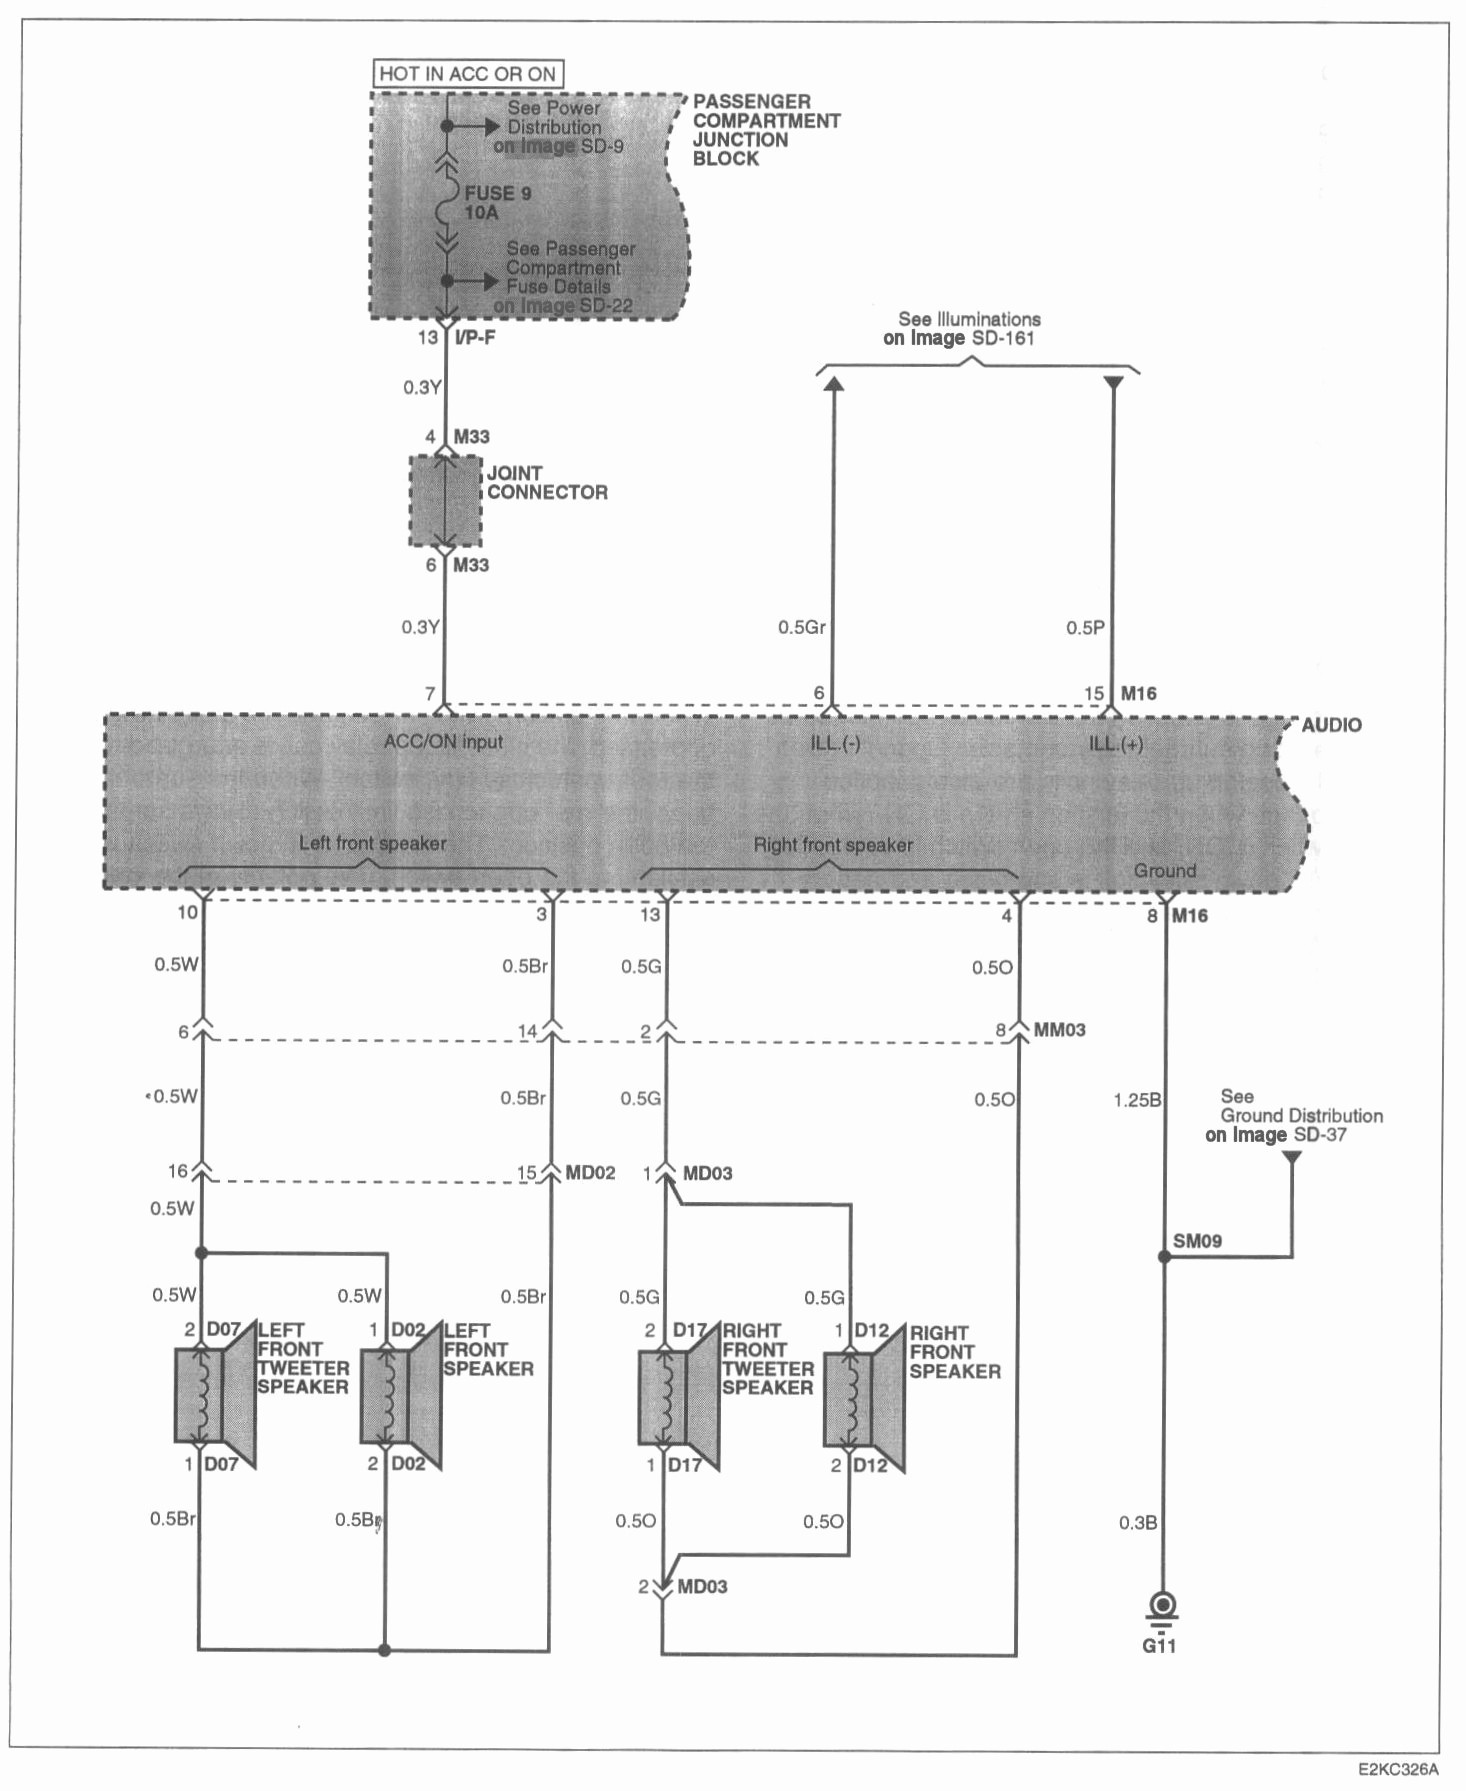 santa fe wiring diagrams 2001 sr 3339  2013 santa fe wiring diagram schematic wiring  2013 santa fe wiring diagram schematic